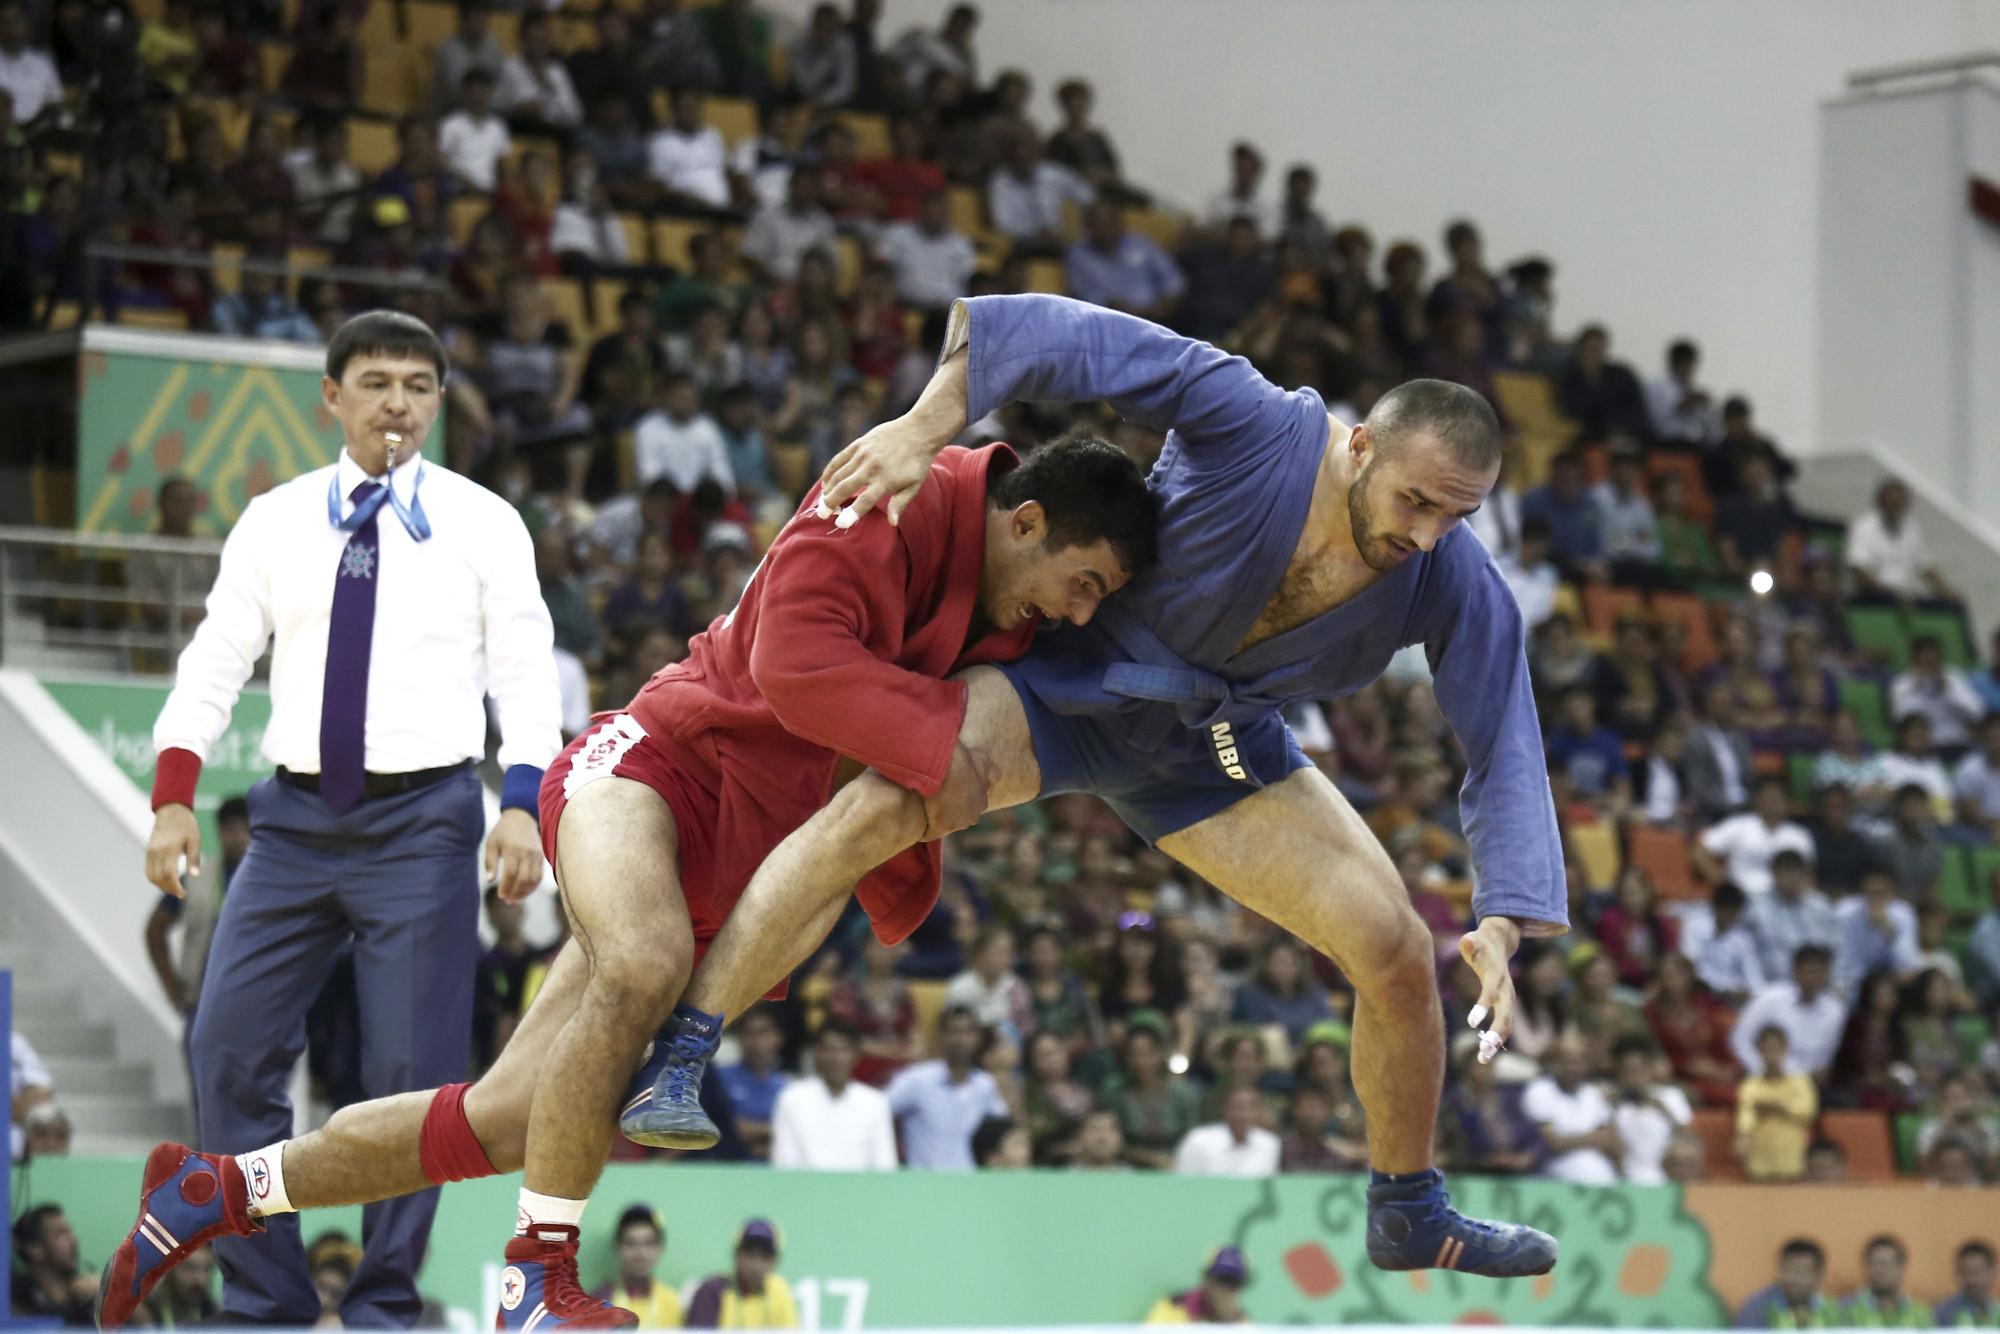 Sambo competition begun yesterday at the 2017 Asian Indoor and Martial Arts Games ©Ashgabat 2017/Lazaros Koukorikos/Laurel International Management